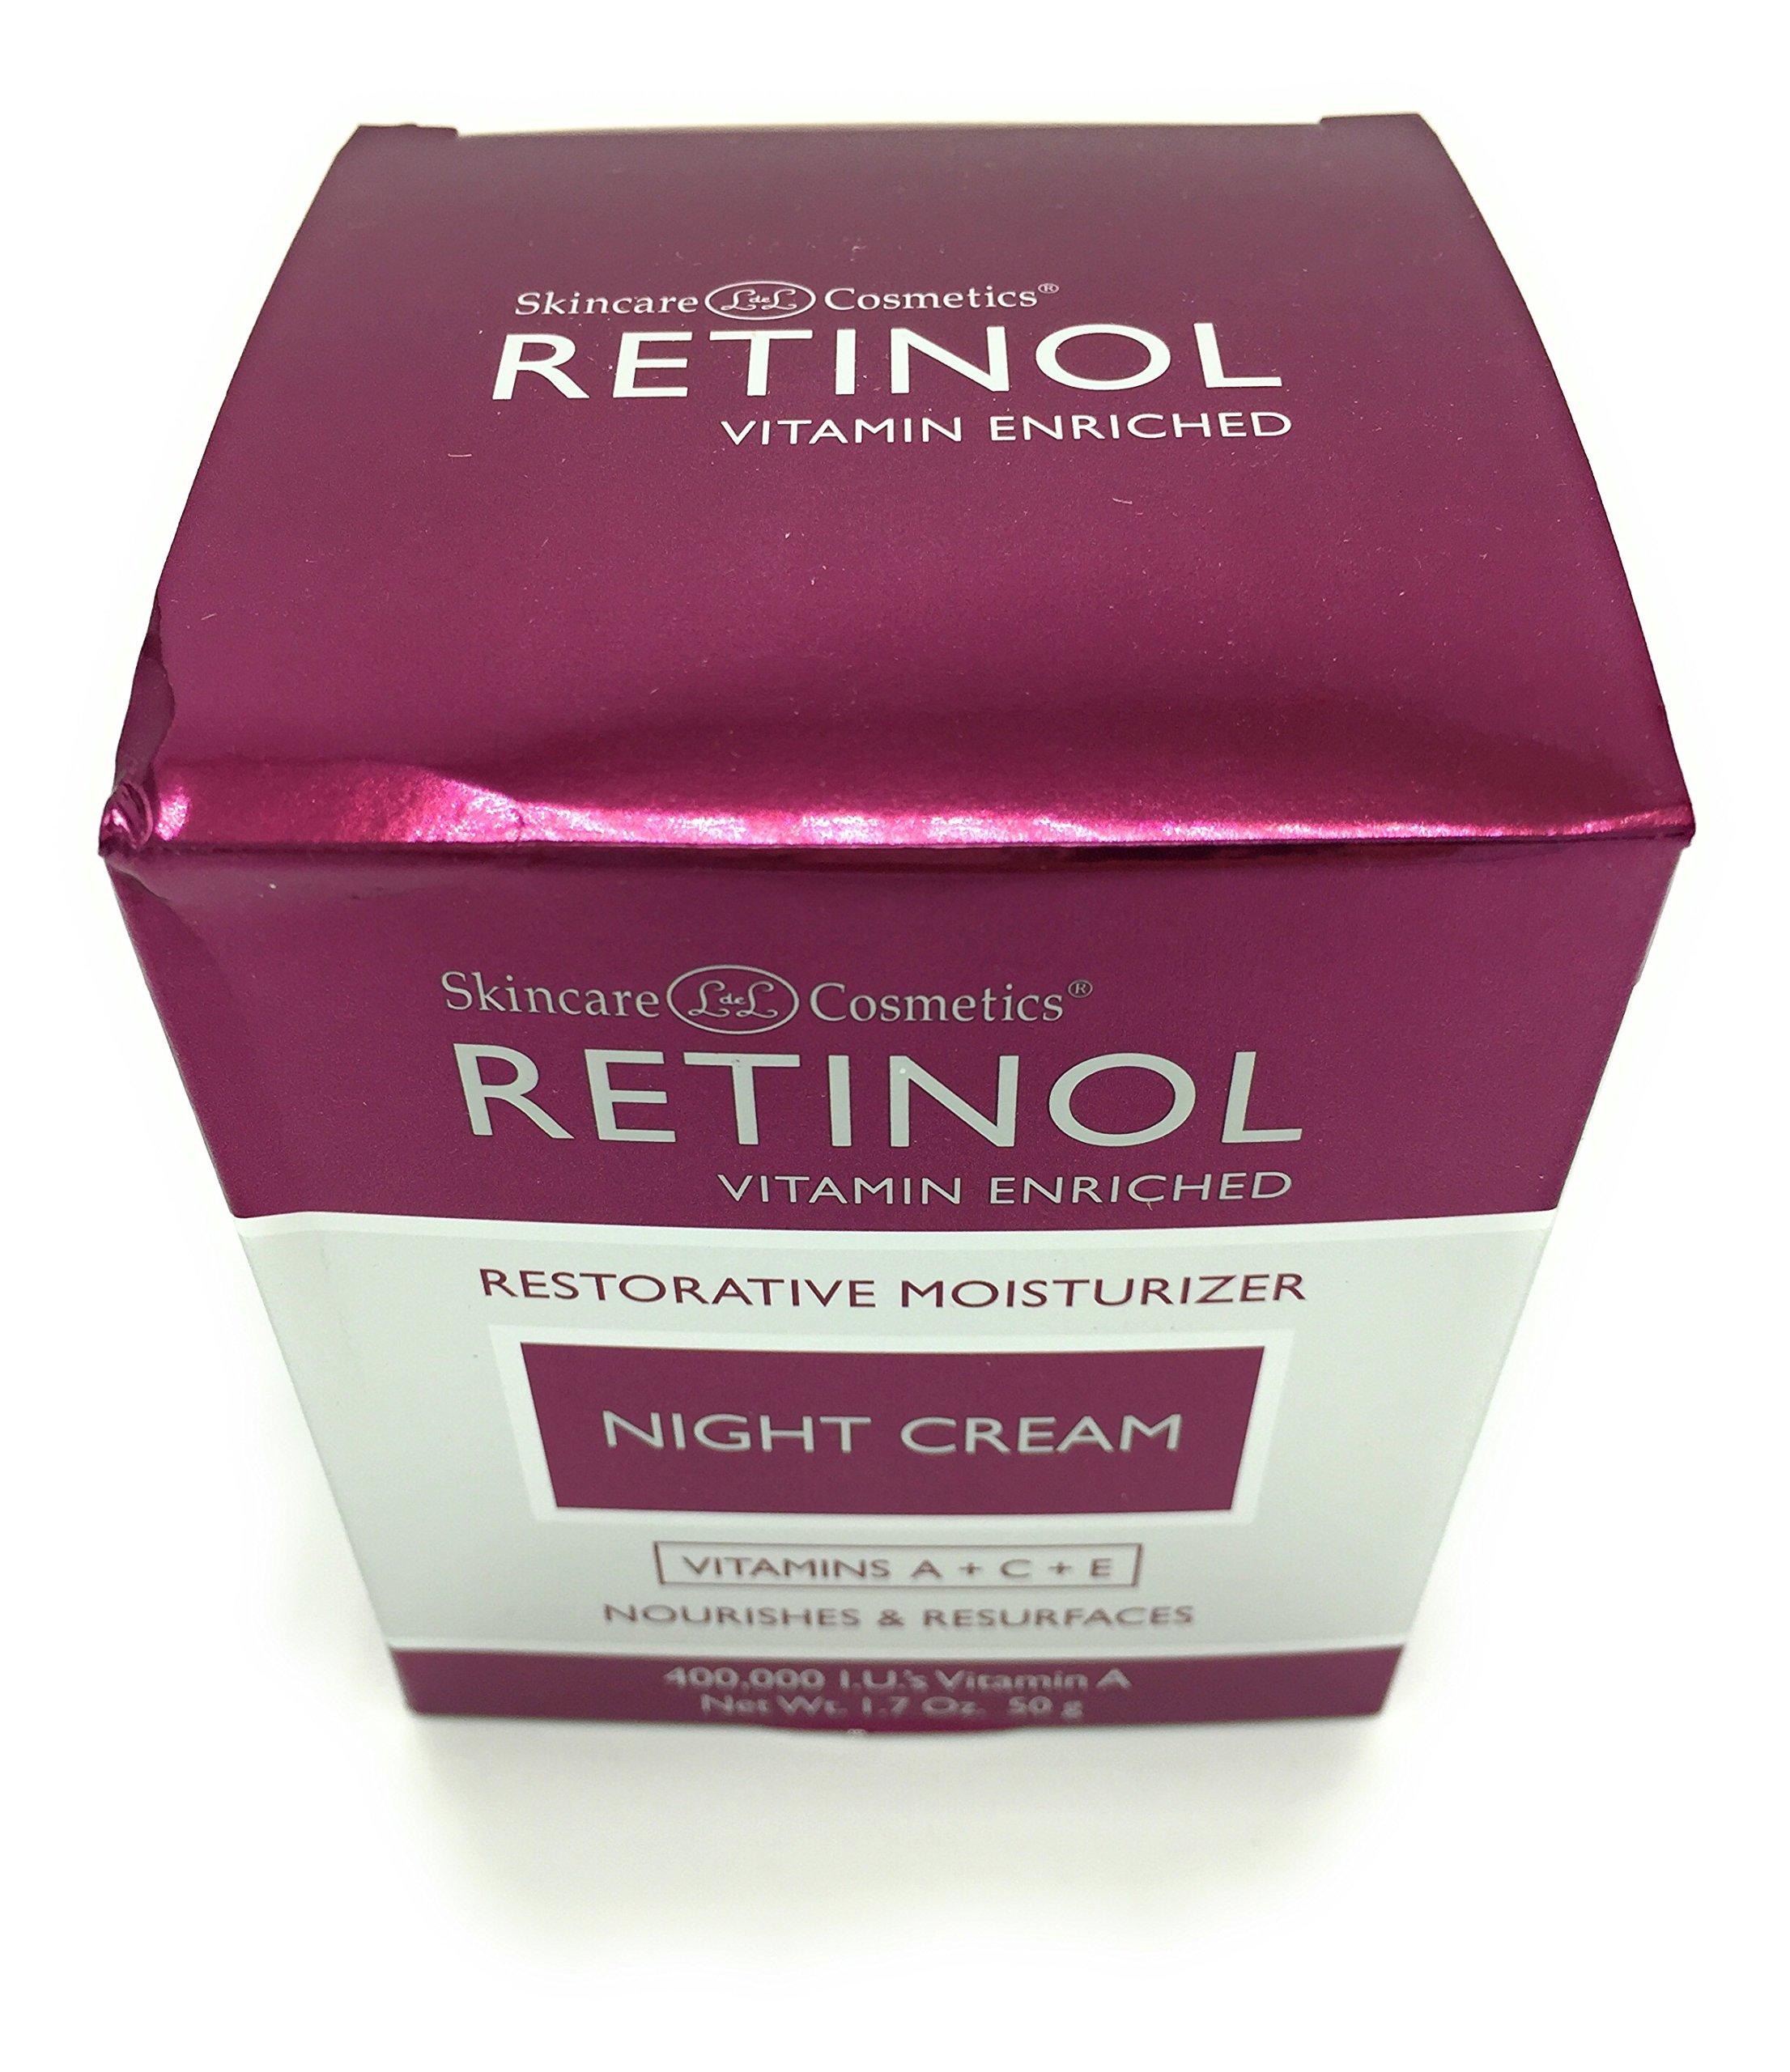 Skincare LdeL Cosmetics Retinol Vitamin Enriched Night Cream 1.7 ounces